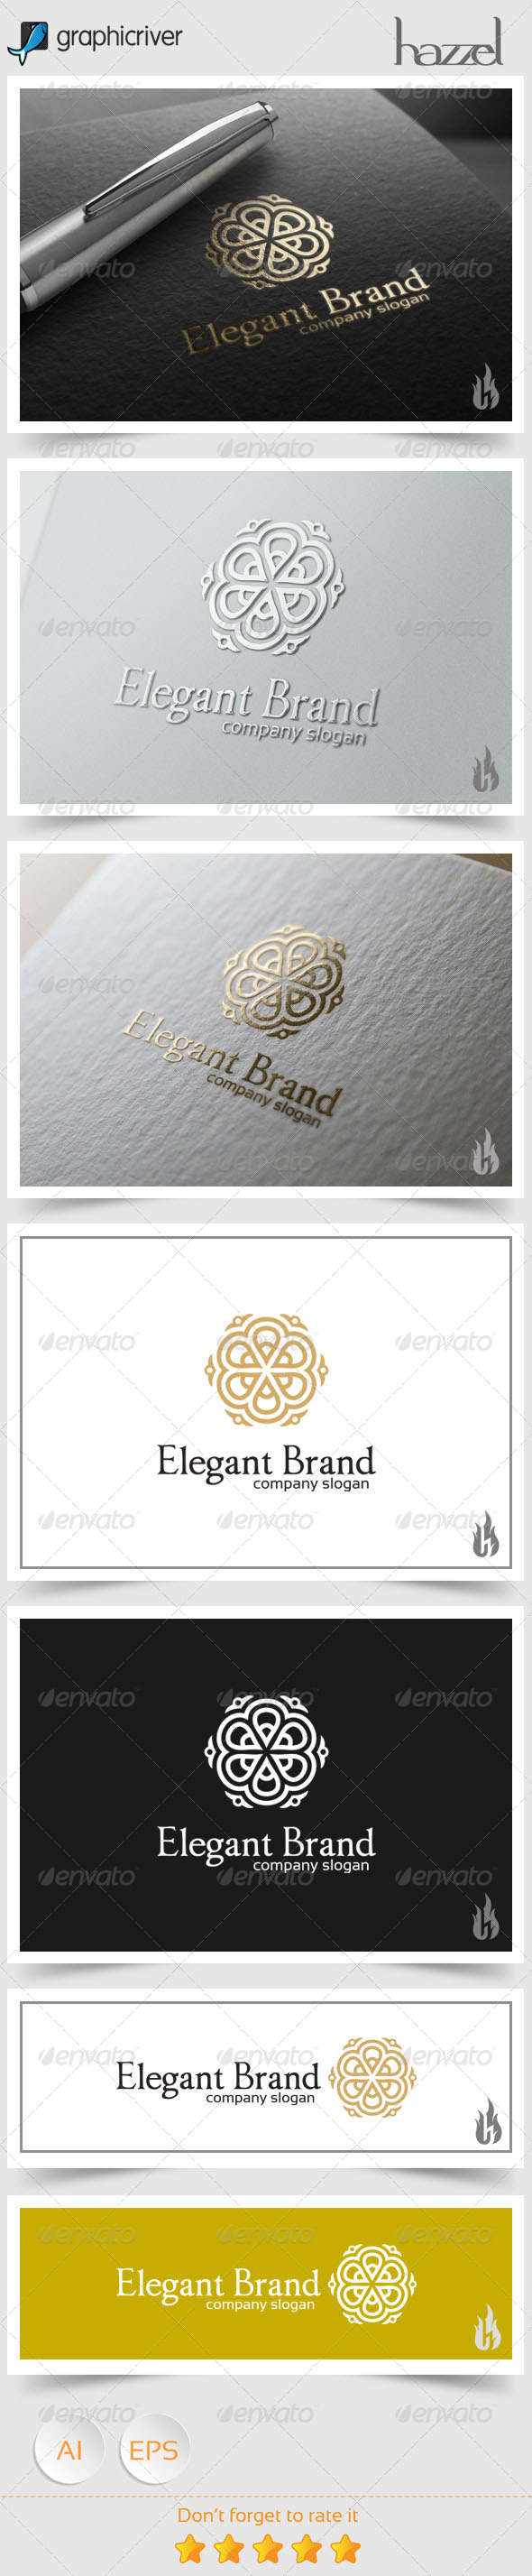 GraphicRiver Elegant Brand Logo 8661149